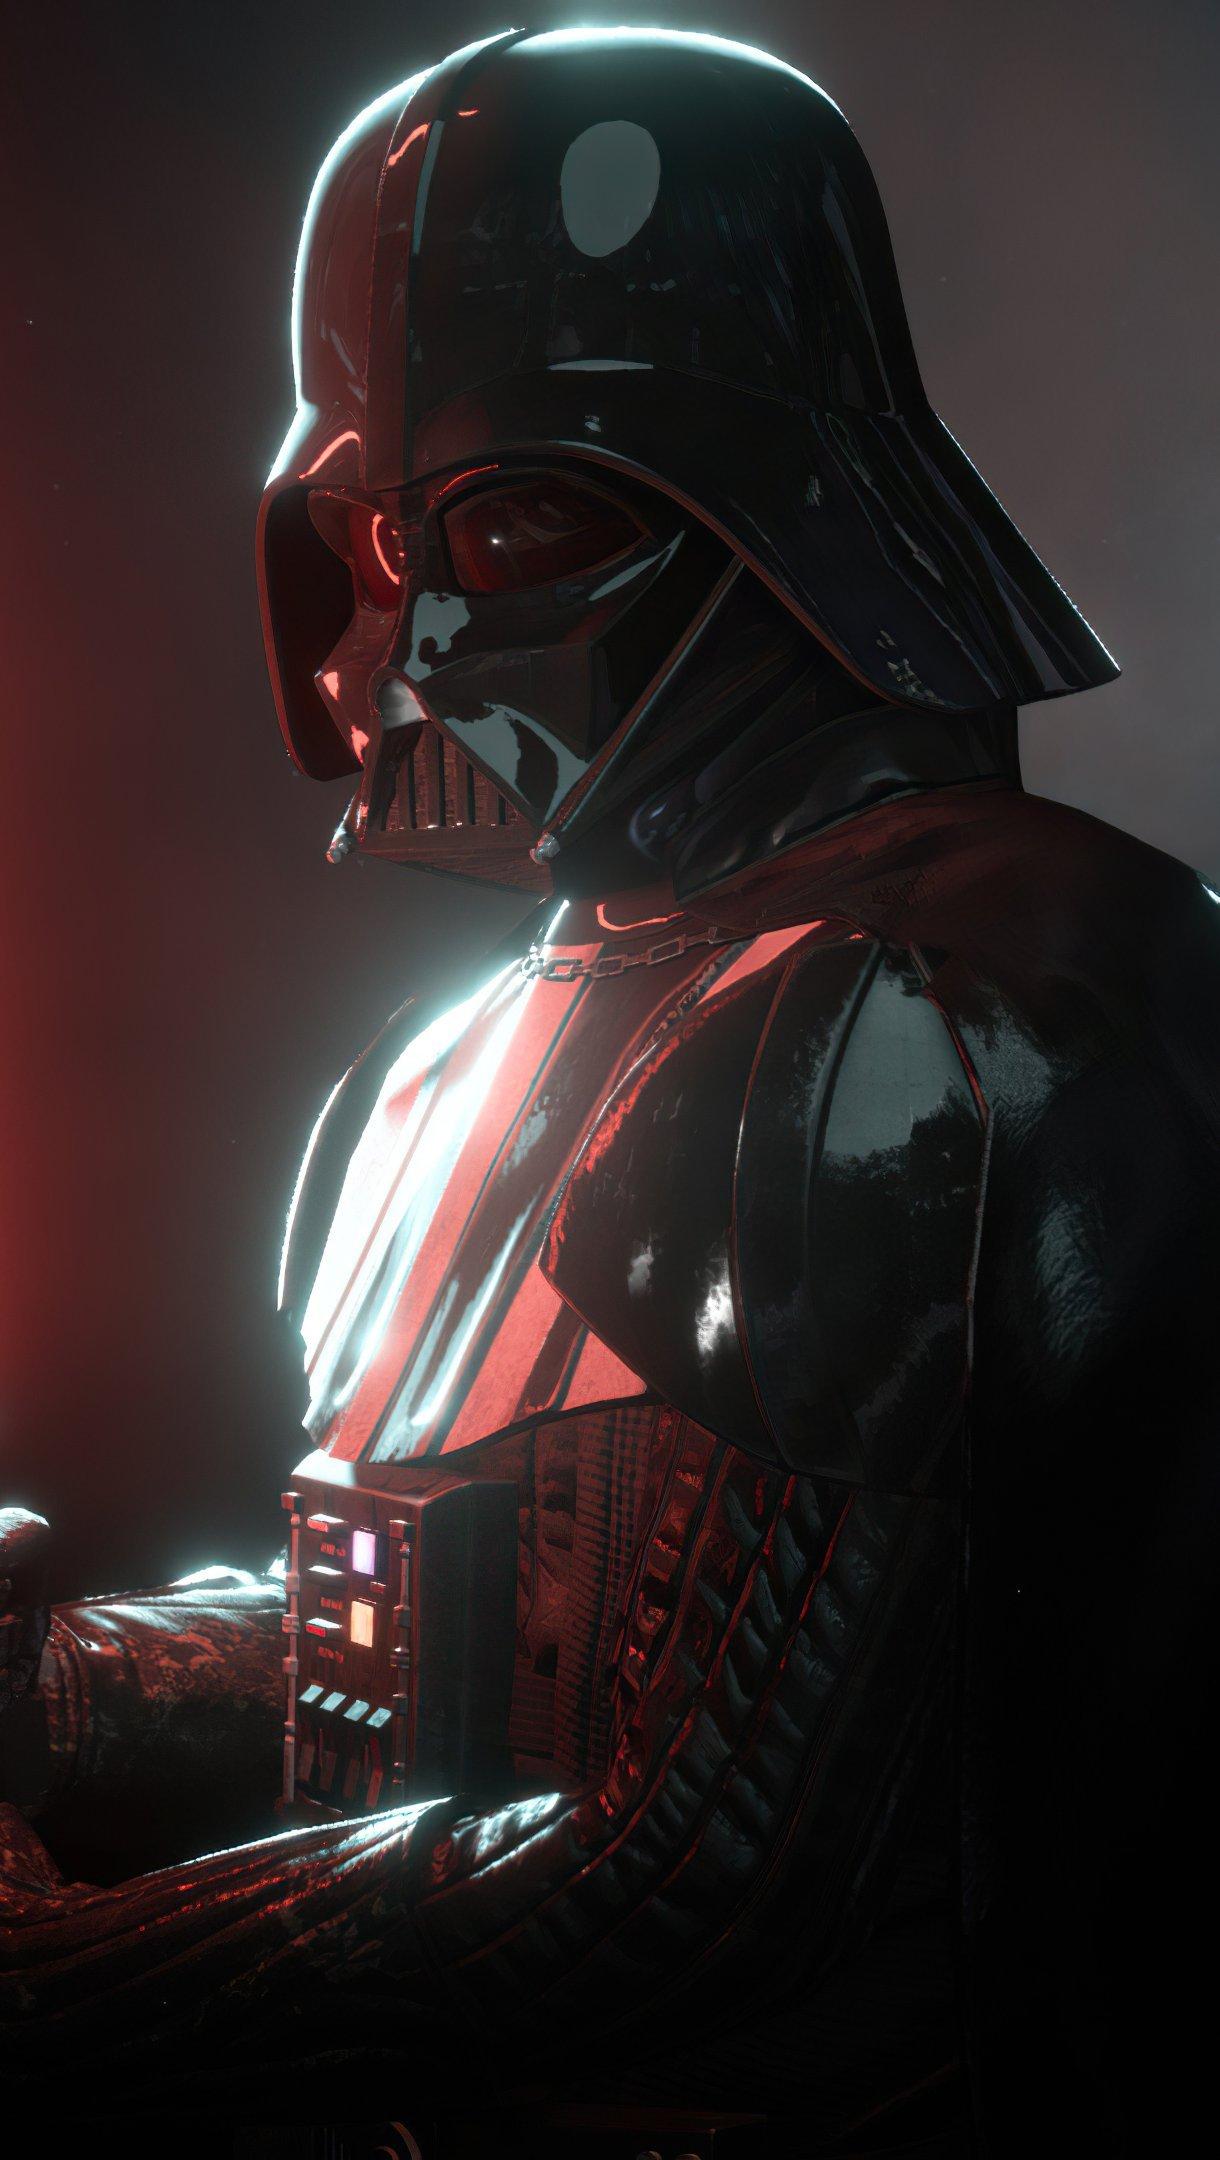 Wallpaper Darth Vader Star Wars Battlefront II Vertical